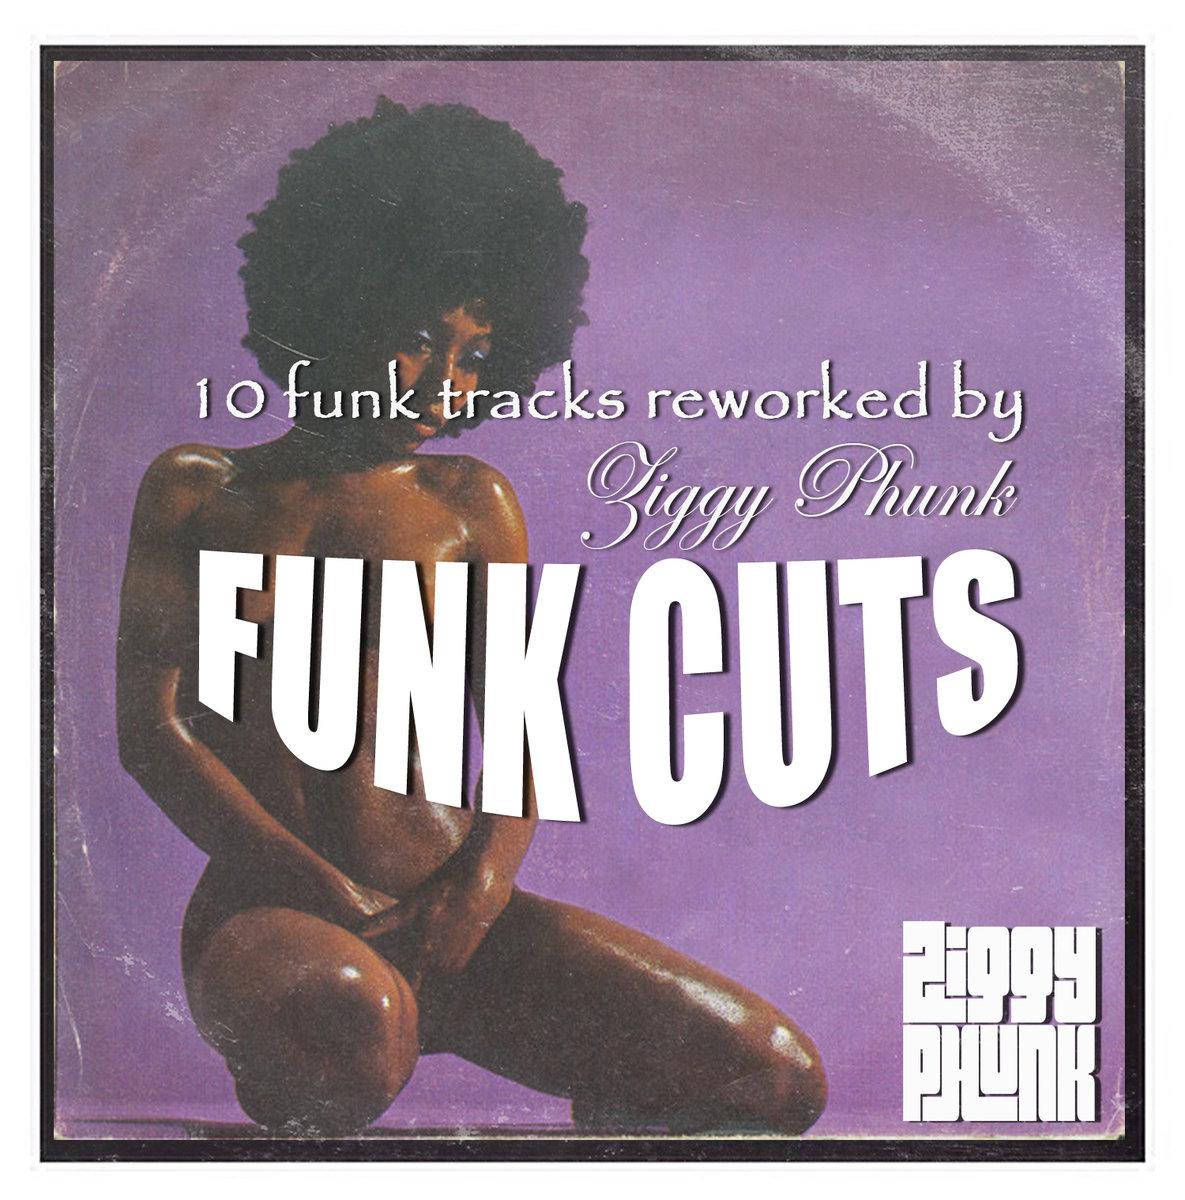 Wilson Pickett - Something You Got  (Ziggy Phunk Edit)